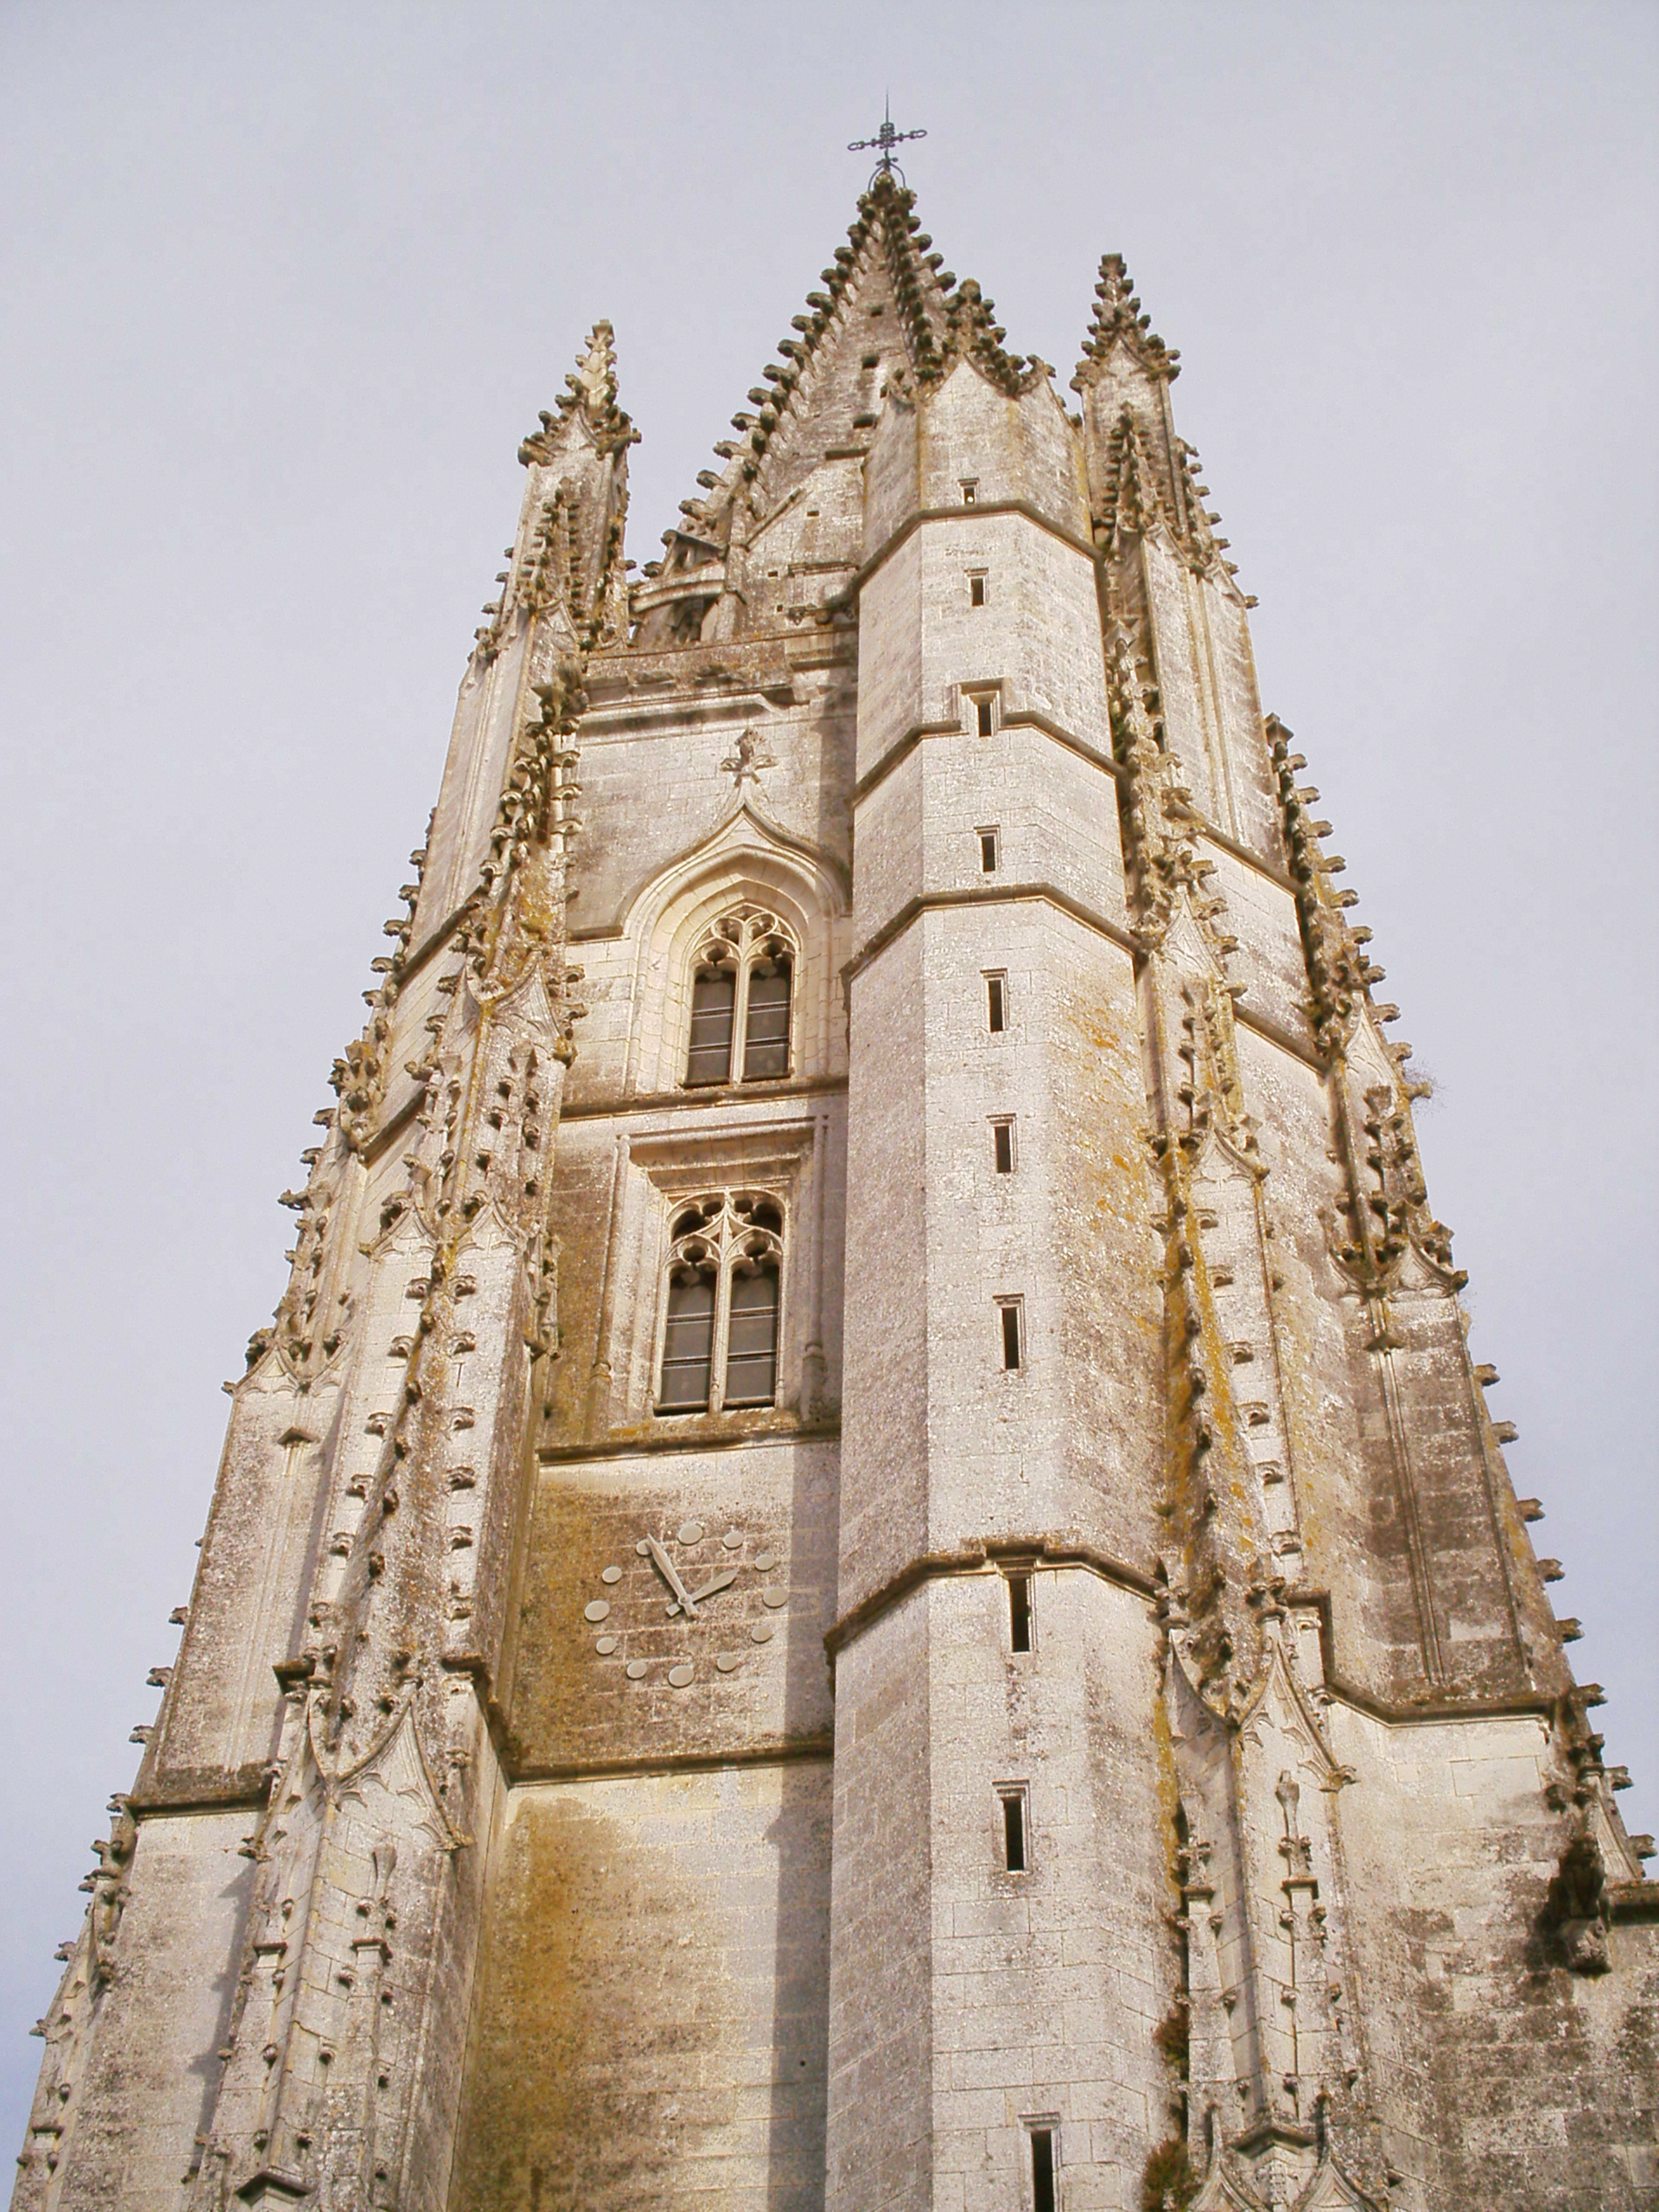 the Saint-Eutrope basilica in Saintes